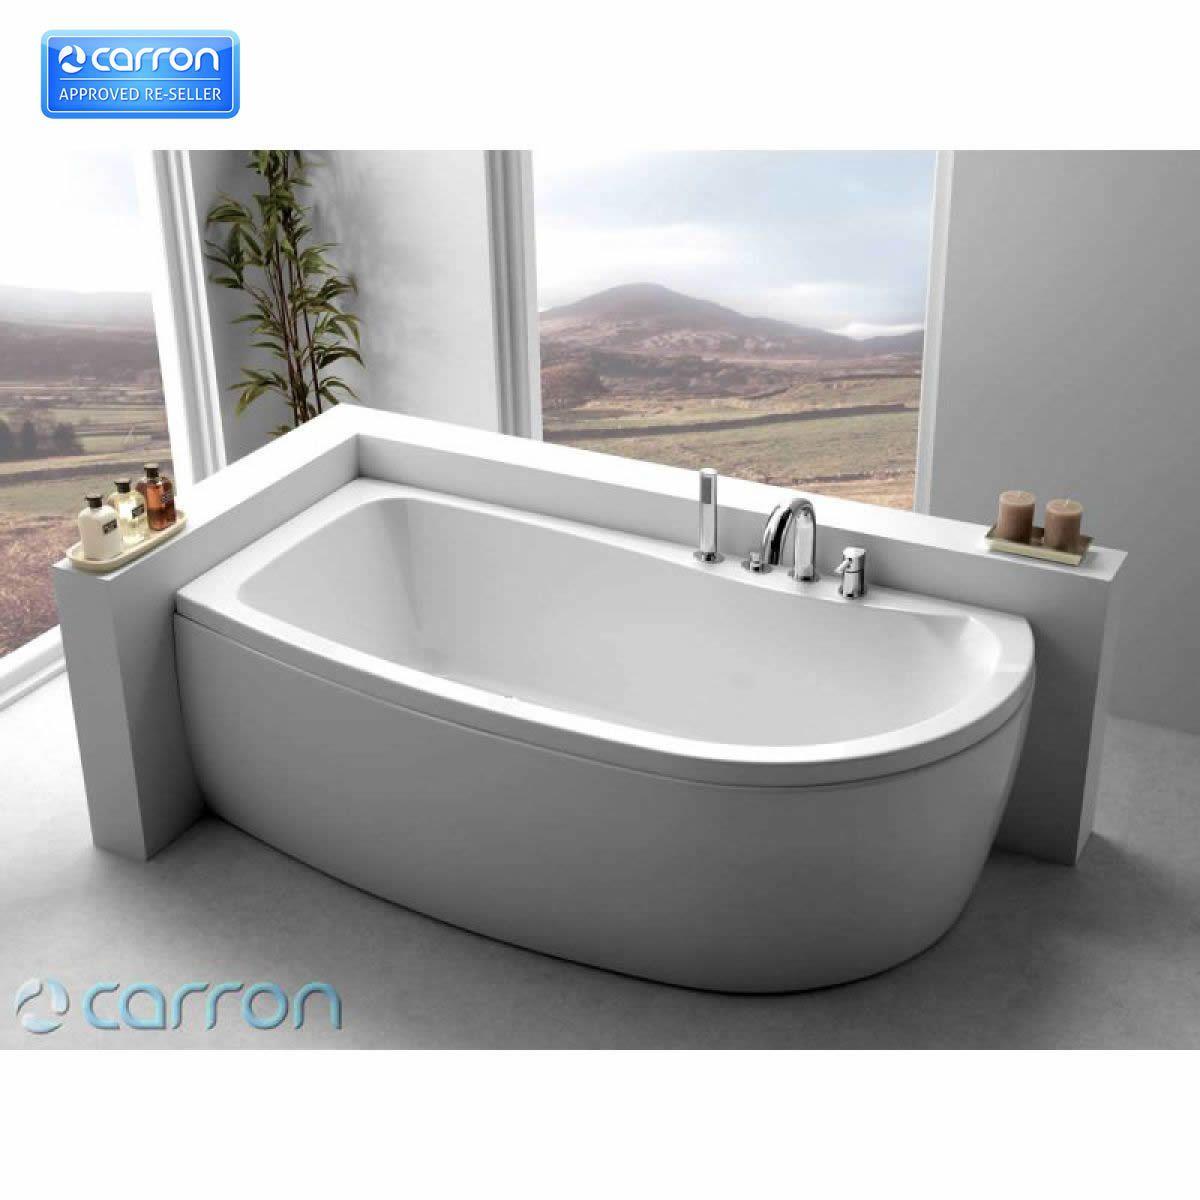 Carron Agenda 1700 X 700mm Corner Offset Shower Bath